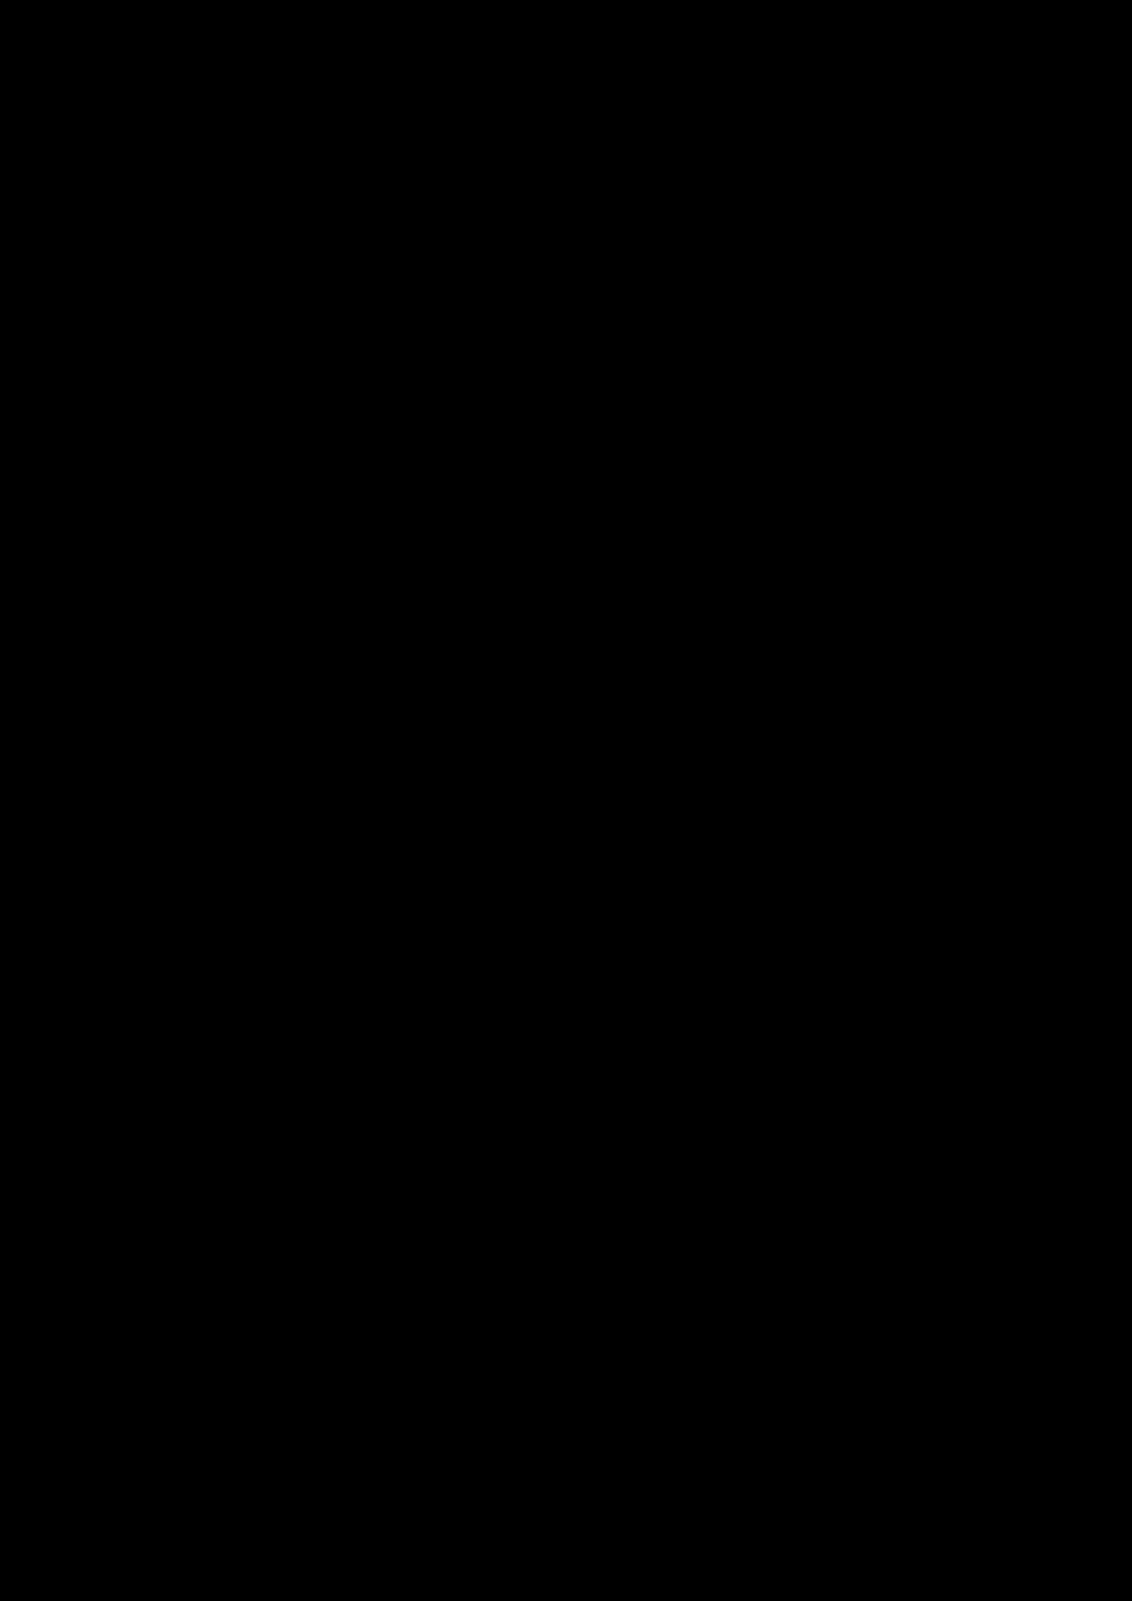 18 berez slide, Image 17